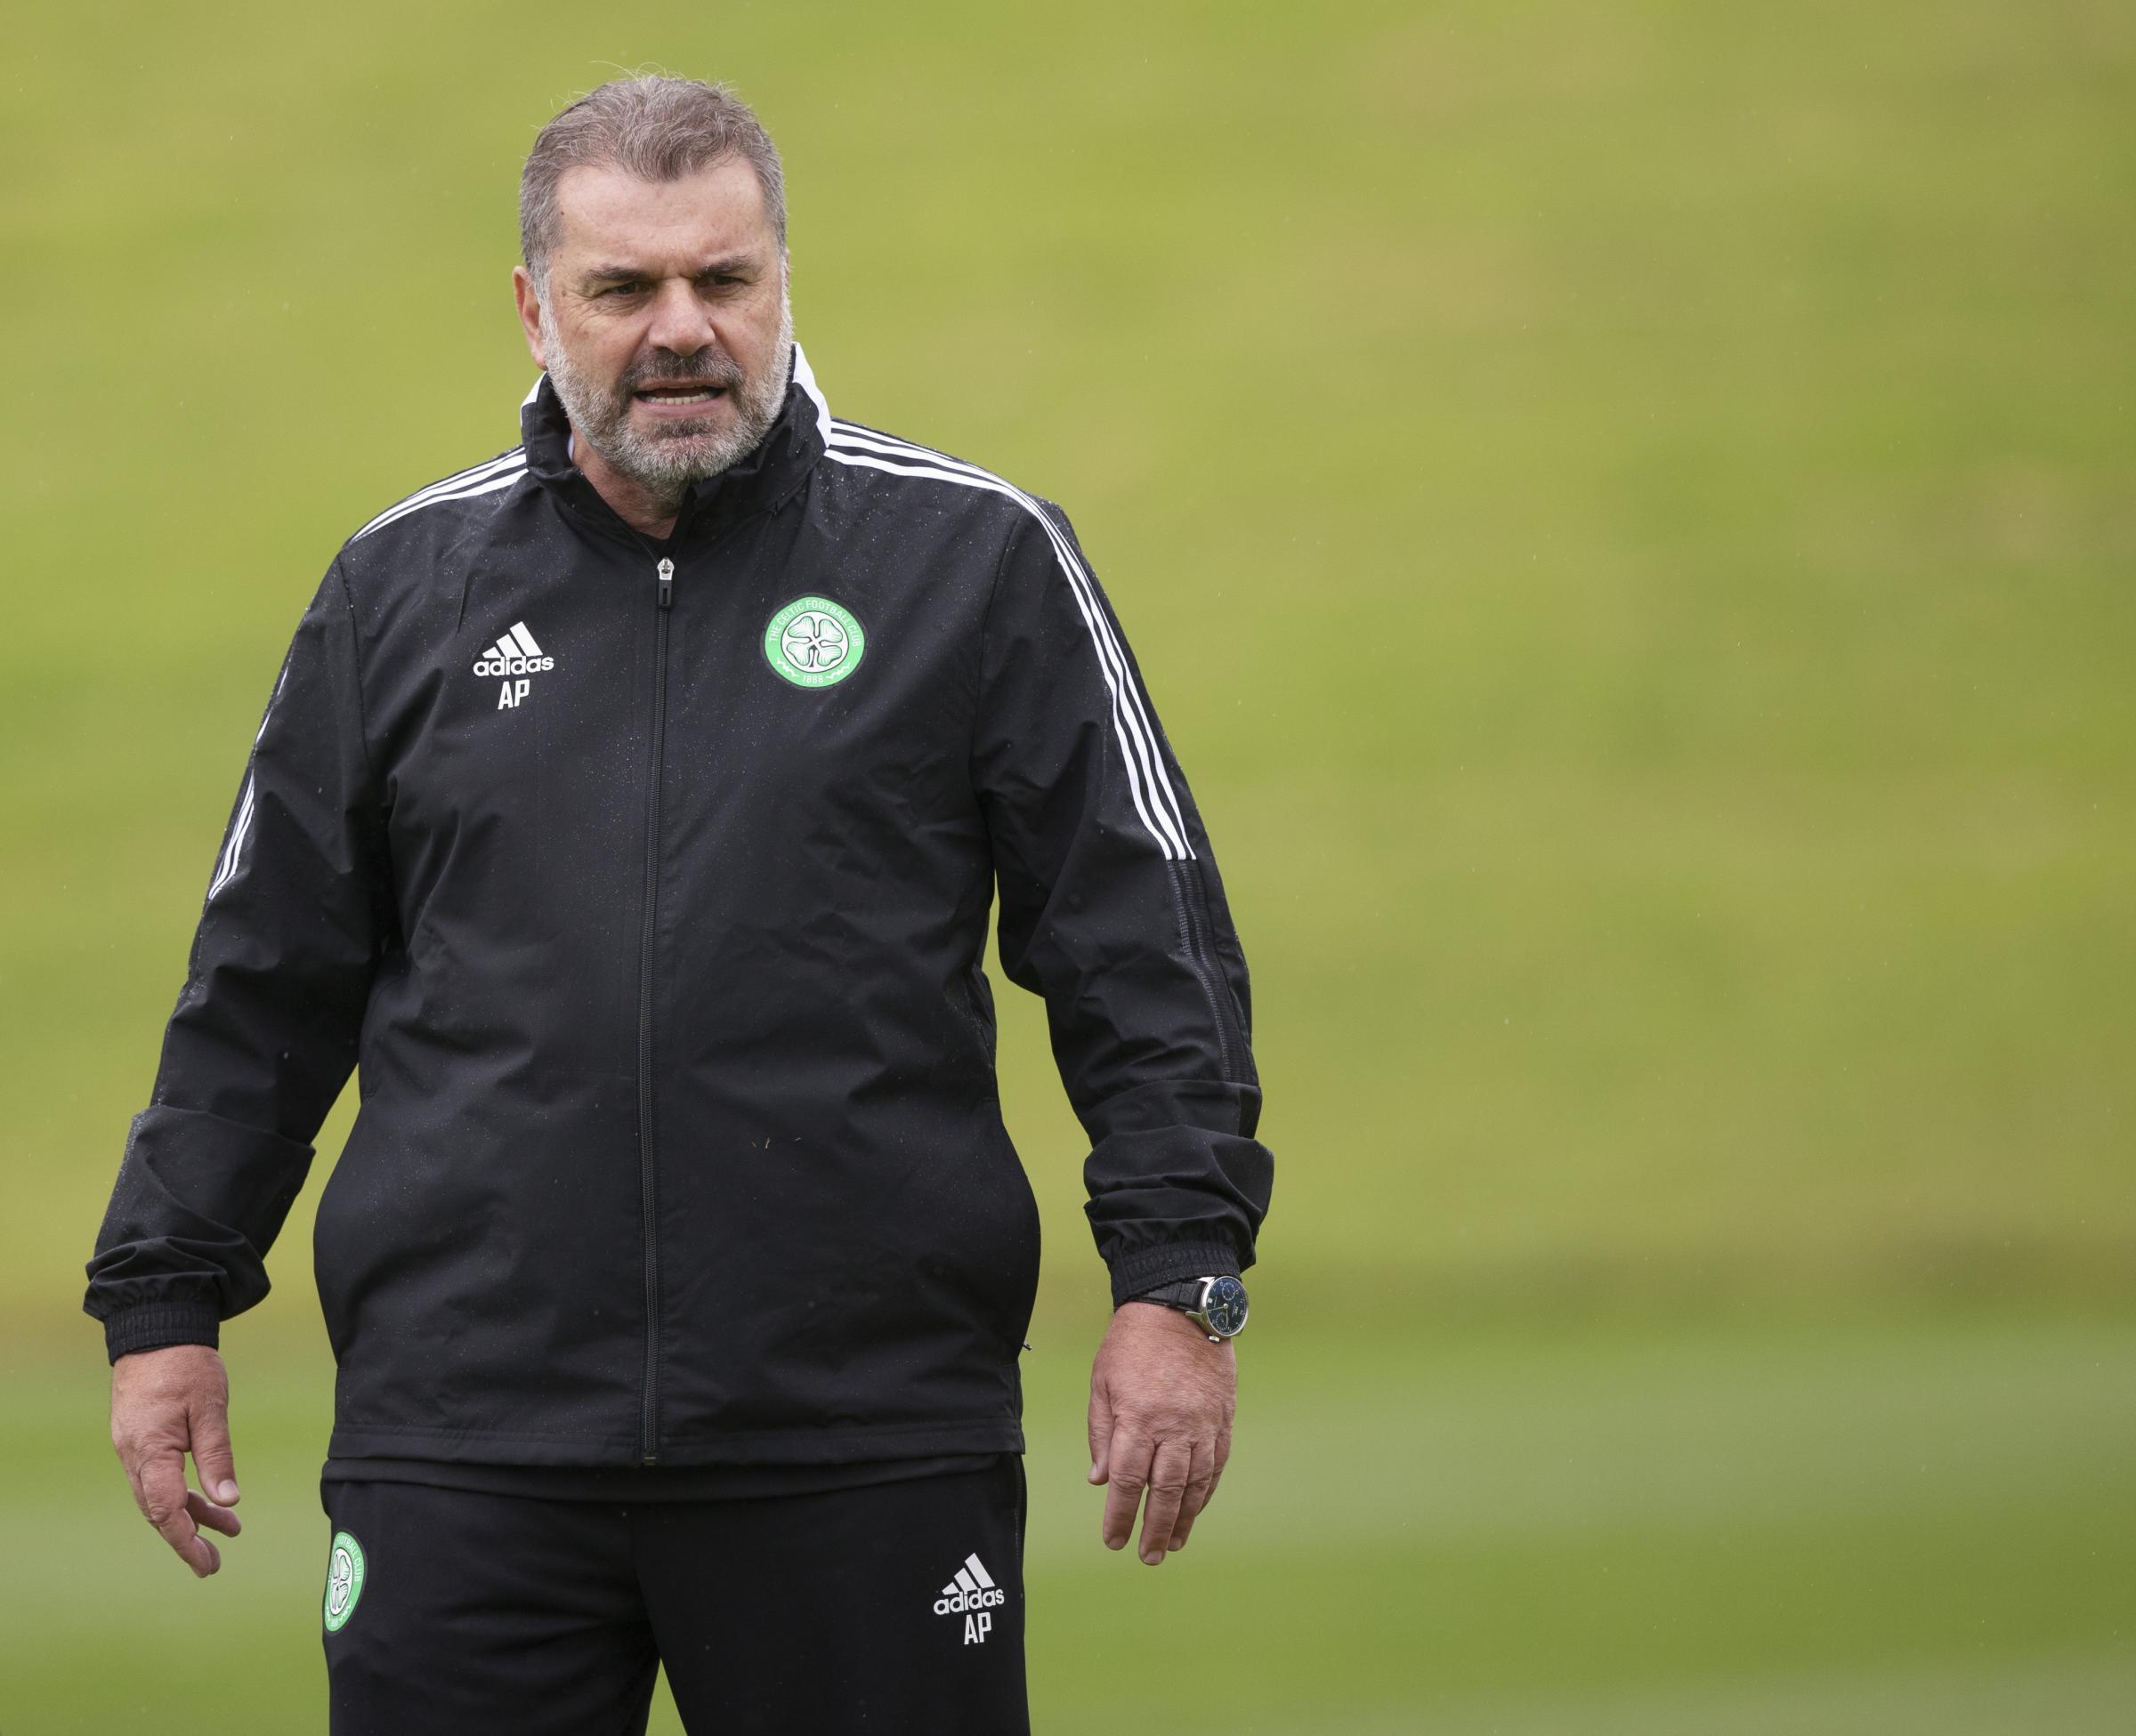 Celtic 3-1 Sheffield Wednesday: Albian Ajeti and Odsonne Edouard on target in opening win for Ange Postecoglou